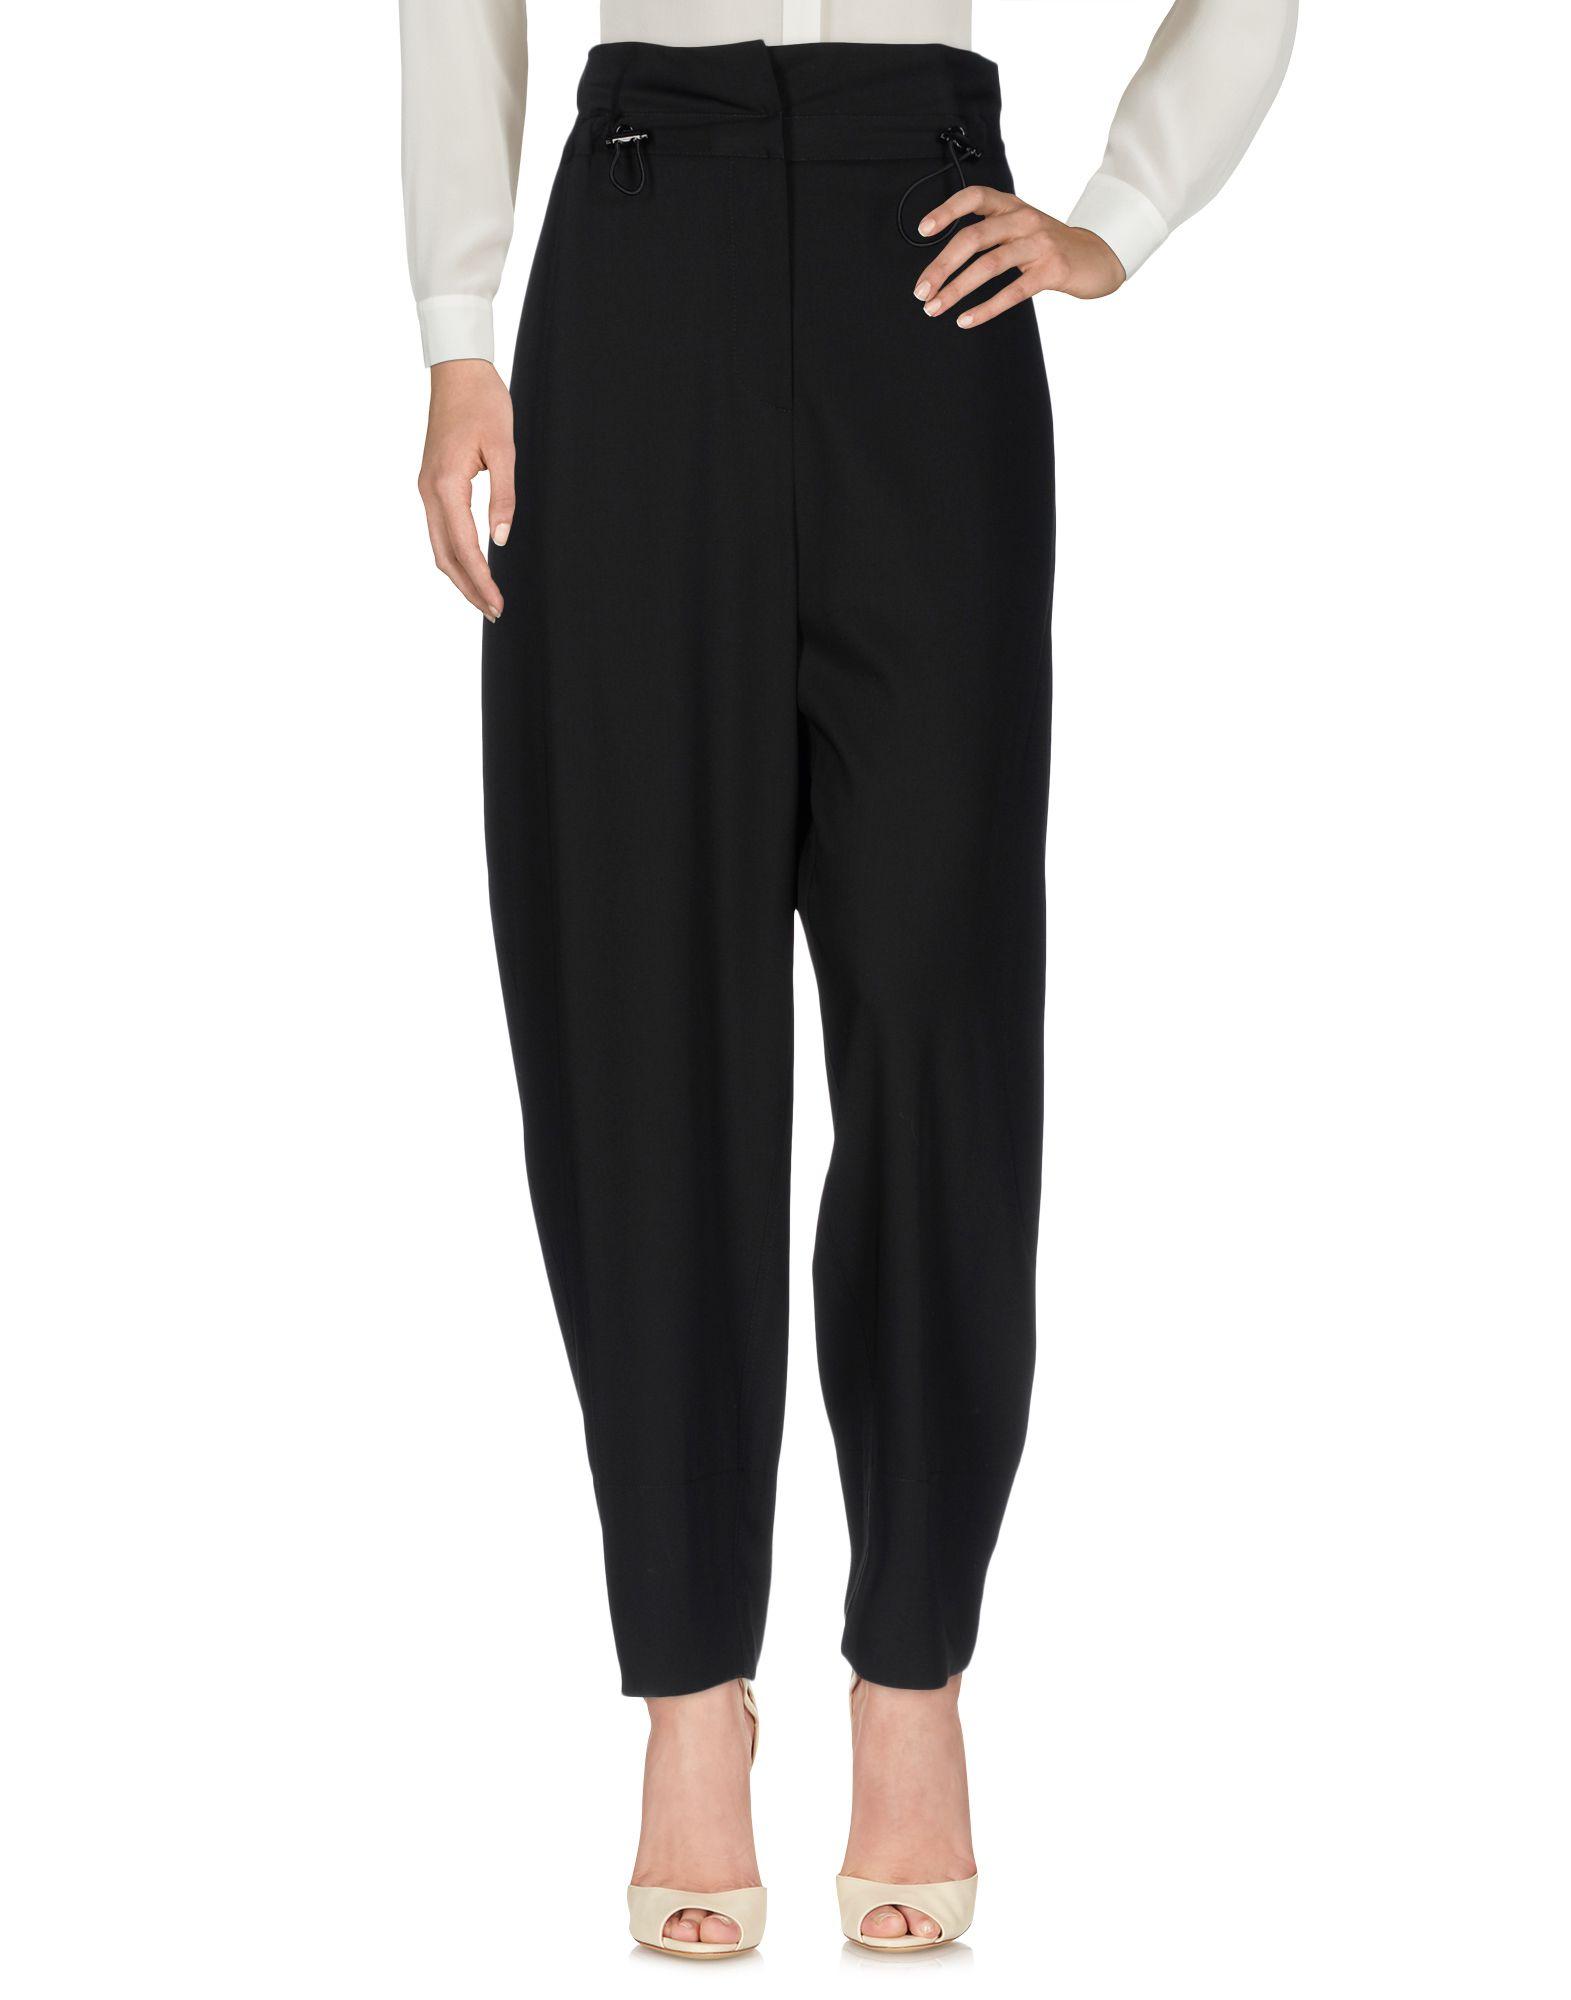 Pantalone Pantalone Stella Mccartney donna - 13083481JI  Stadion Werbegeschenke